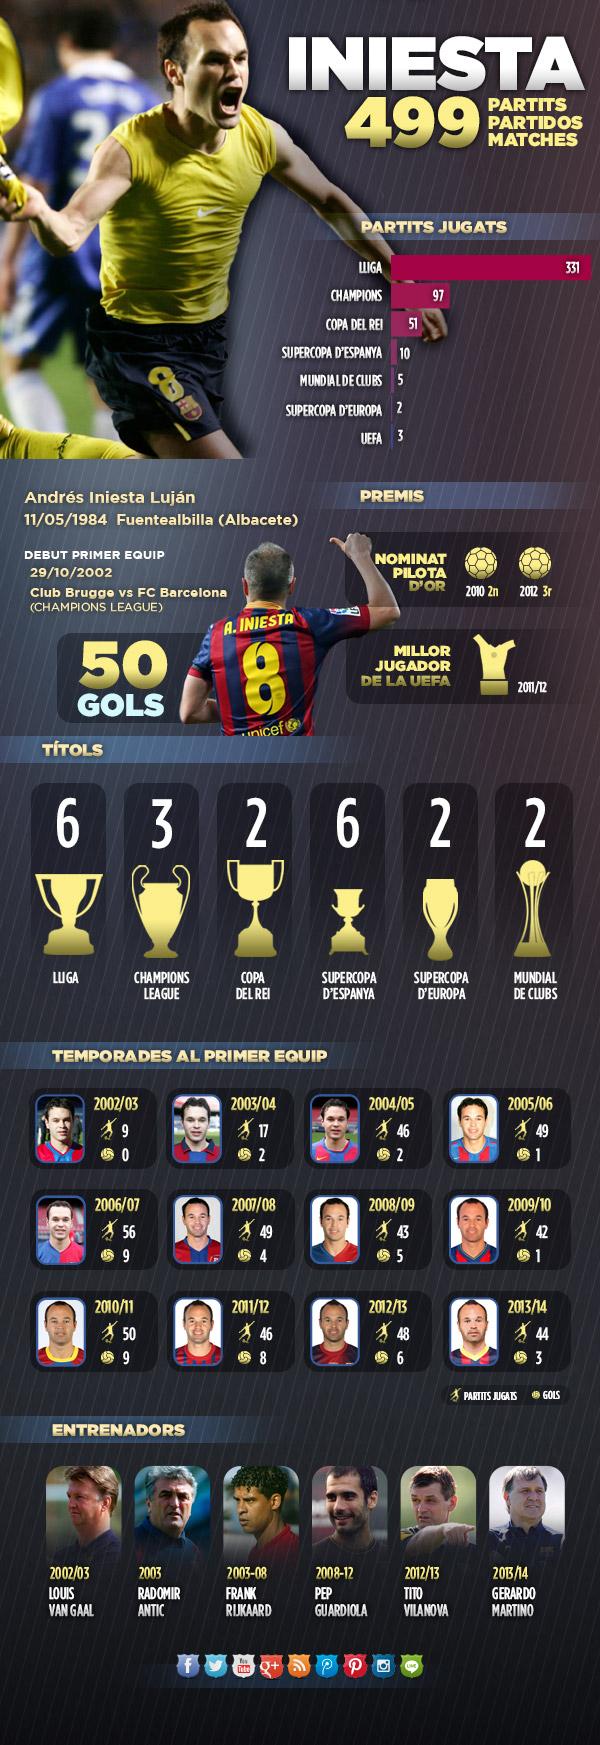 Spécial Messi et FCBarcelone (Part 2) - Page 7 INIESTA-infogr-CAT_2_.v1396891193